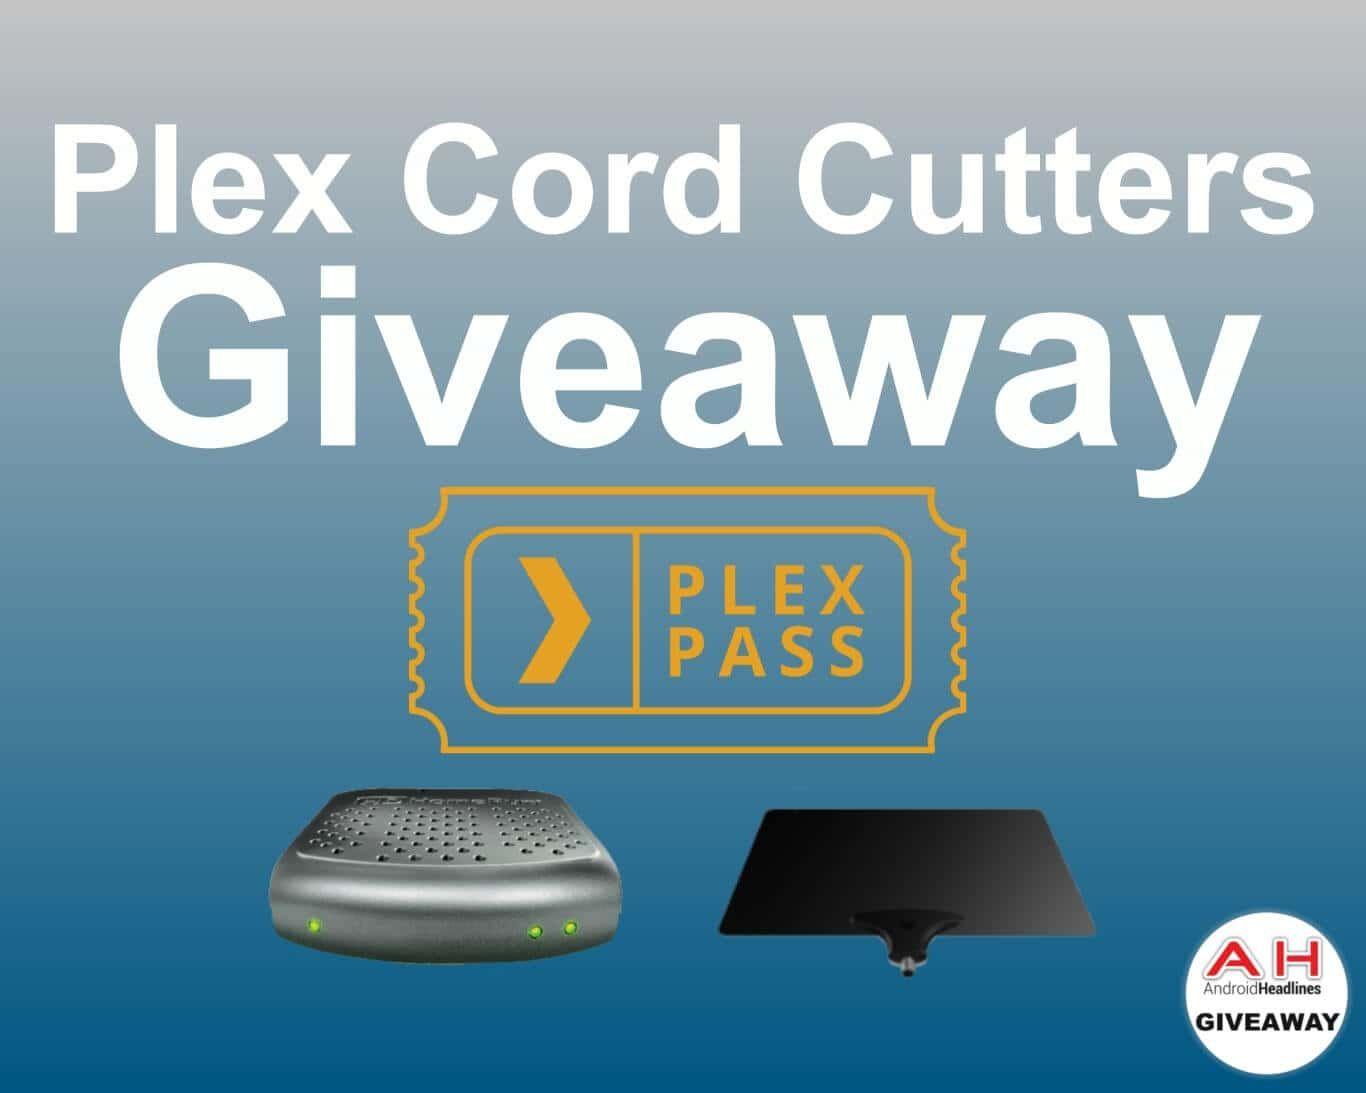 UPDATED WINNER: Cord Cutters Giveaway: Lifetime Plex Pass